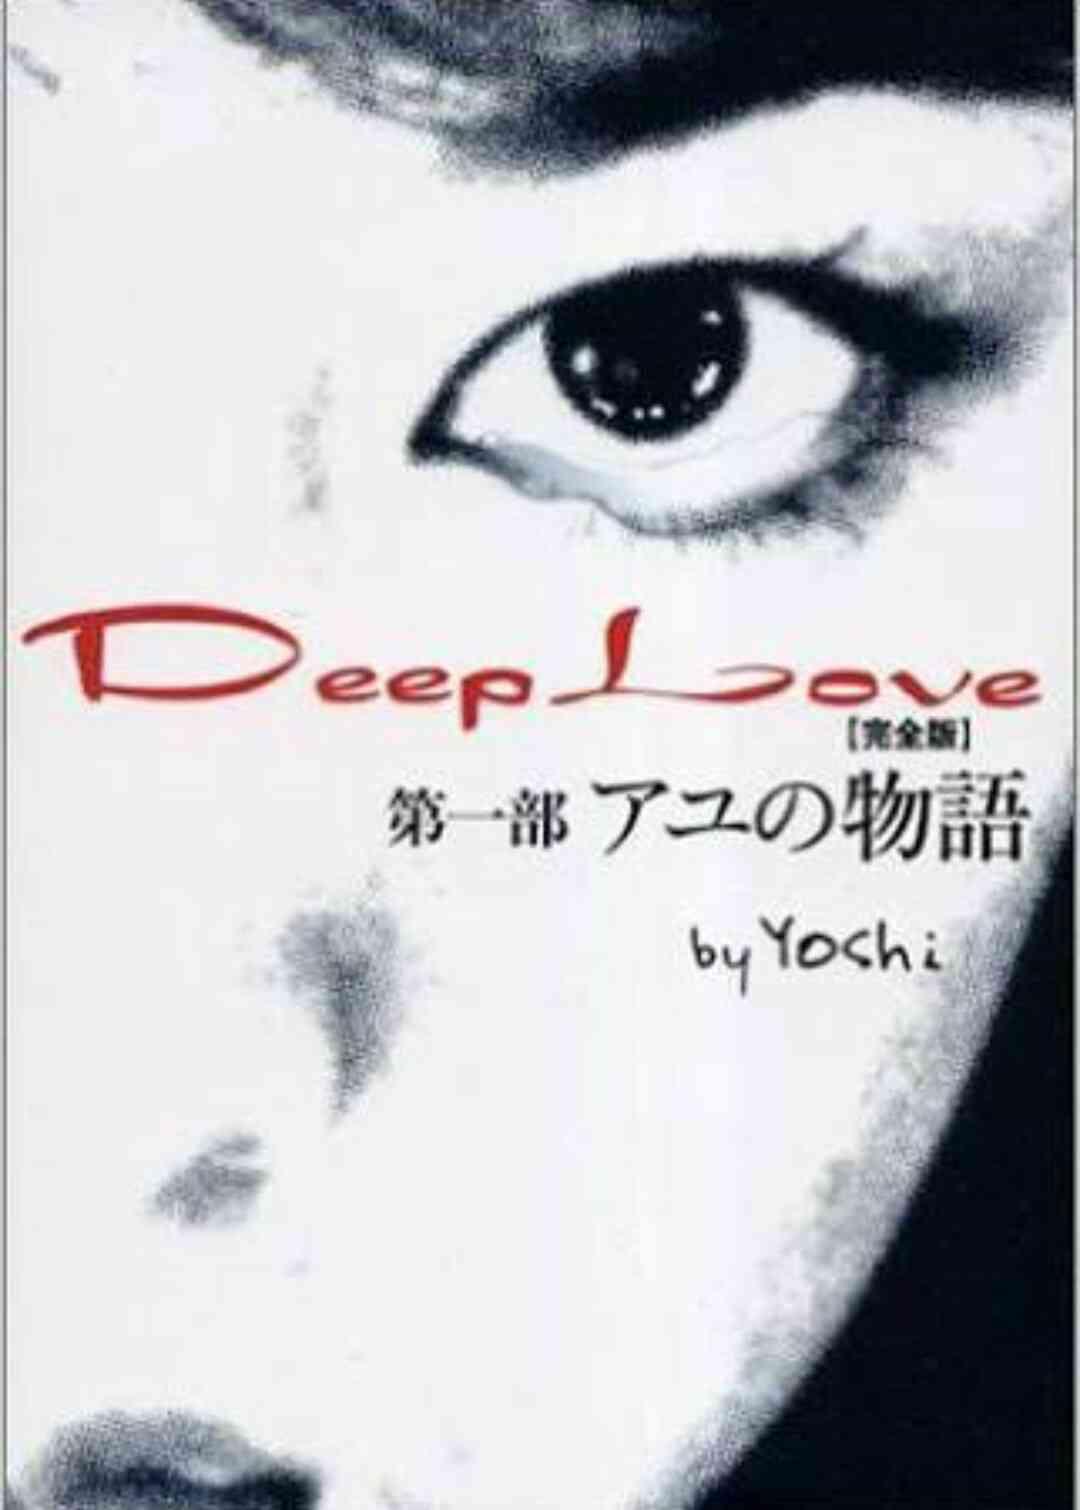 『Deep Love』読んだことある人!